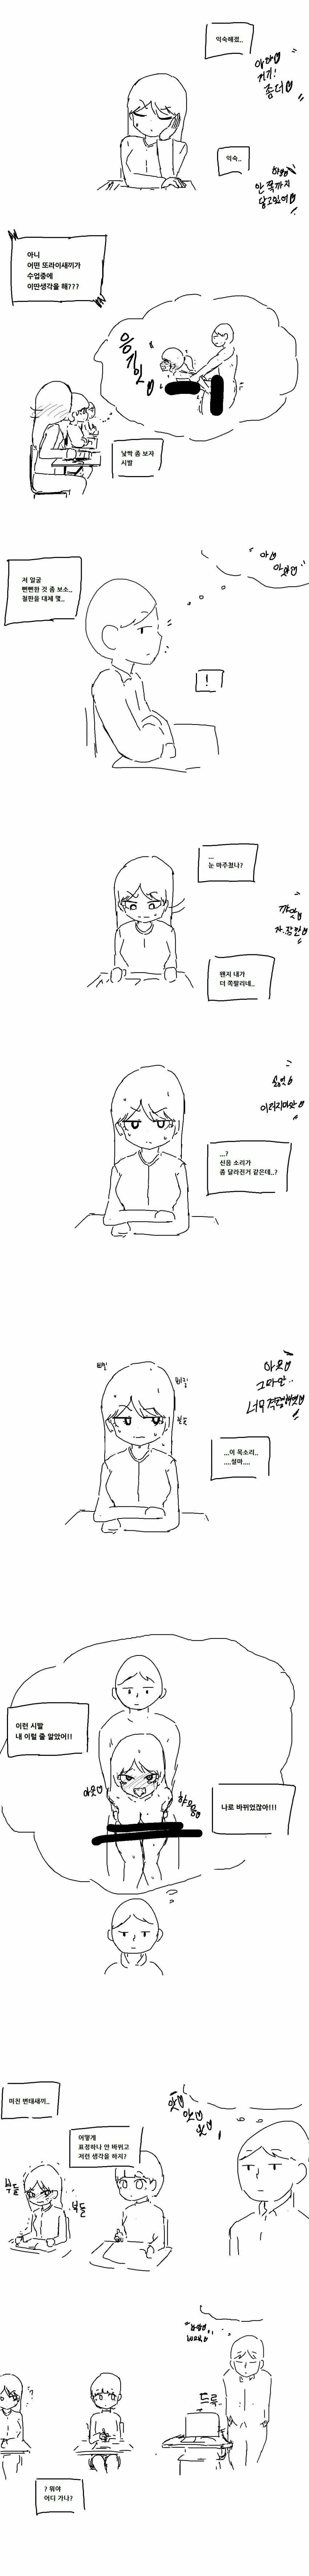 2.jpeg ㅎㅂ)남자의 망상을 볼수있는 만화